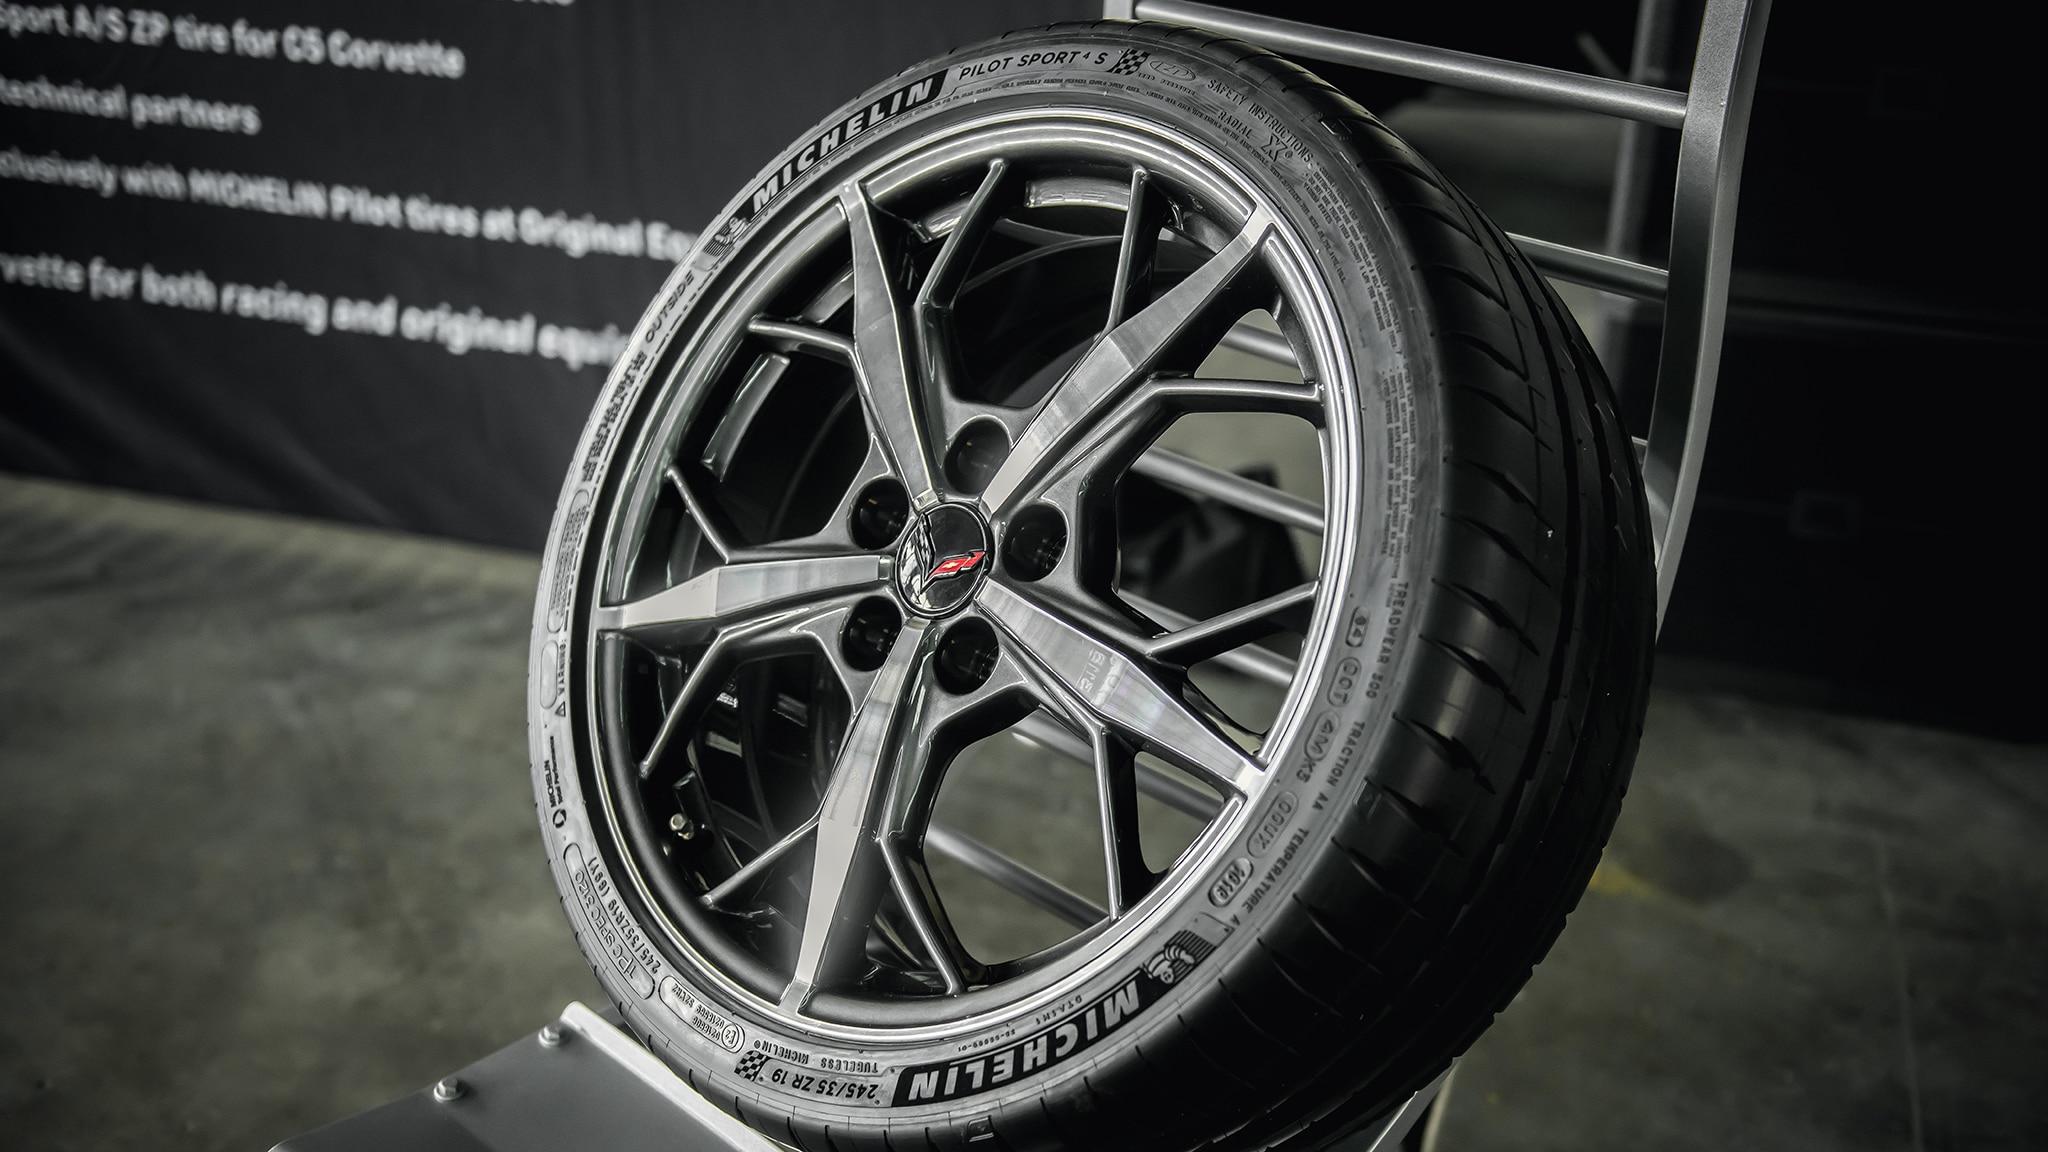 2020 Chevrolet Corvette C8 Specs: Power, Torque, and More